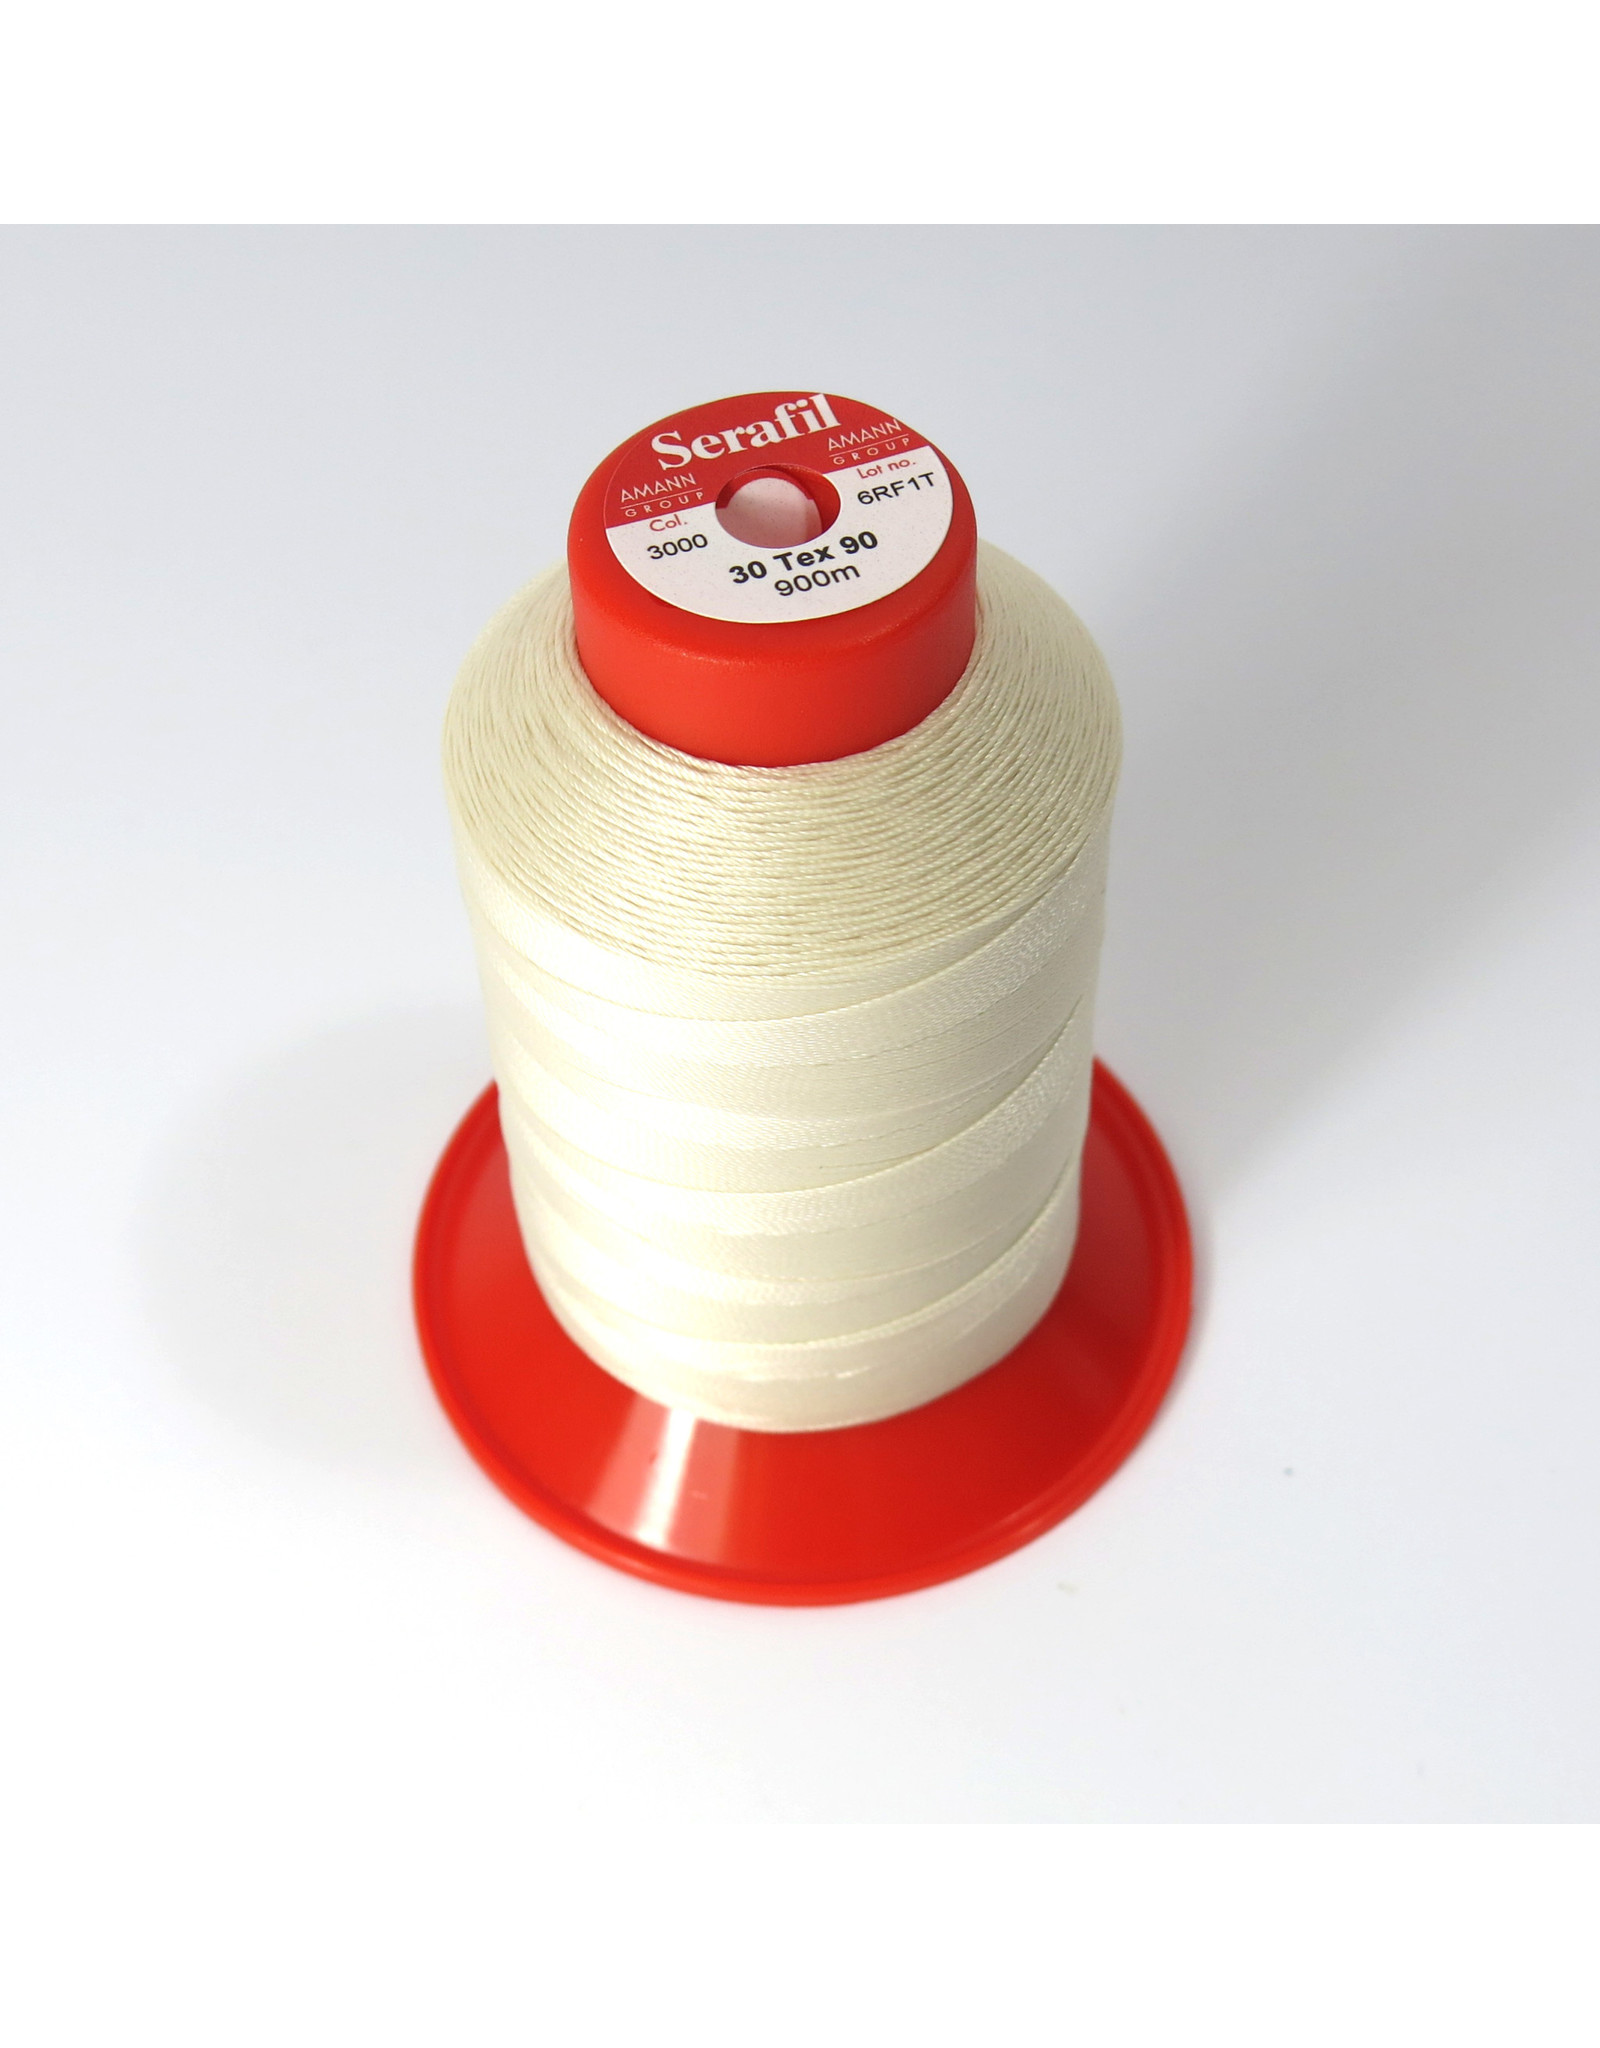 Serafil machine sewing thread 3000